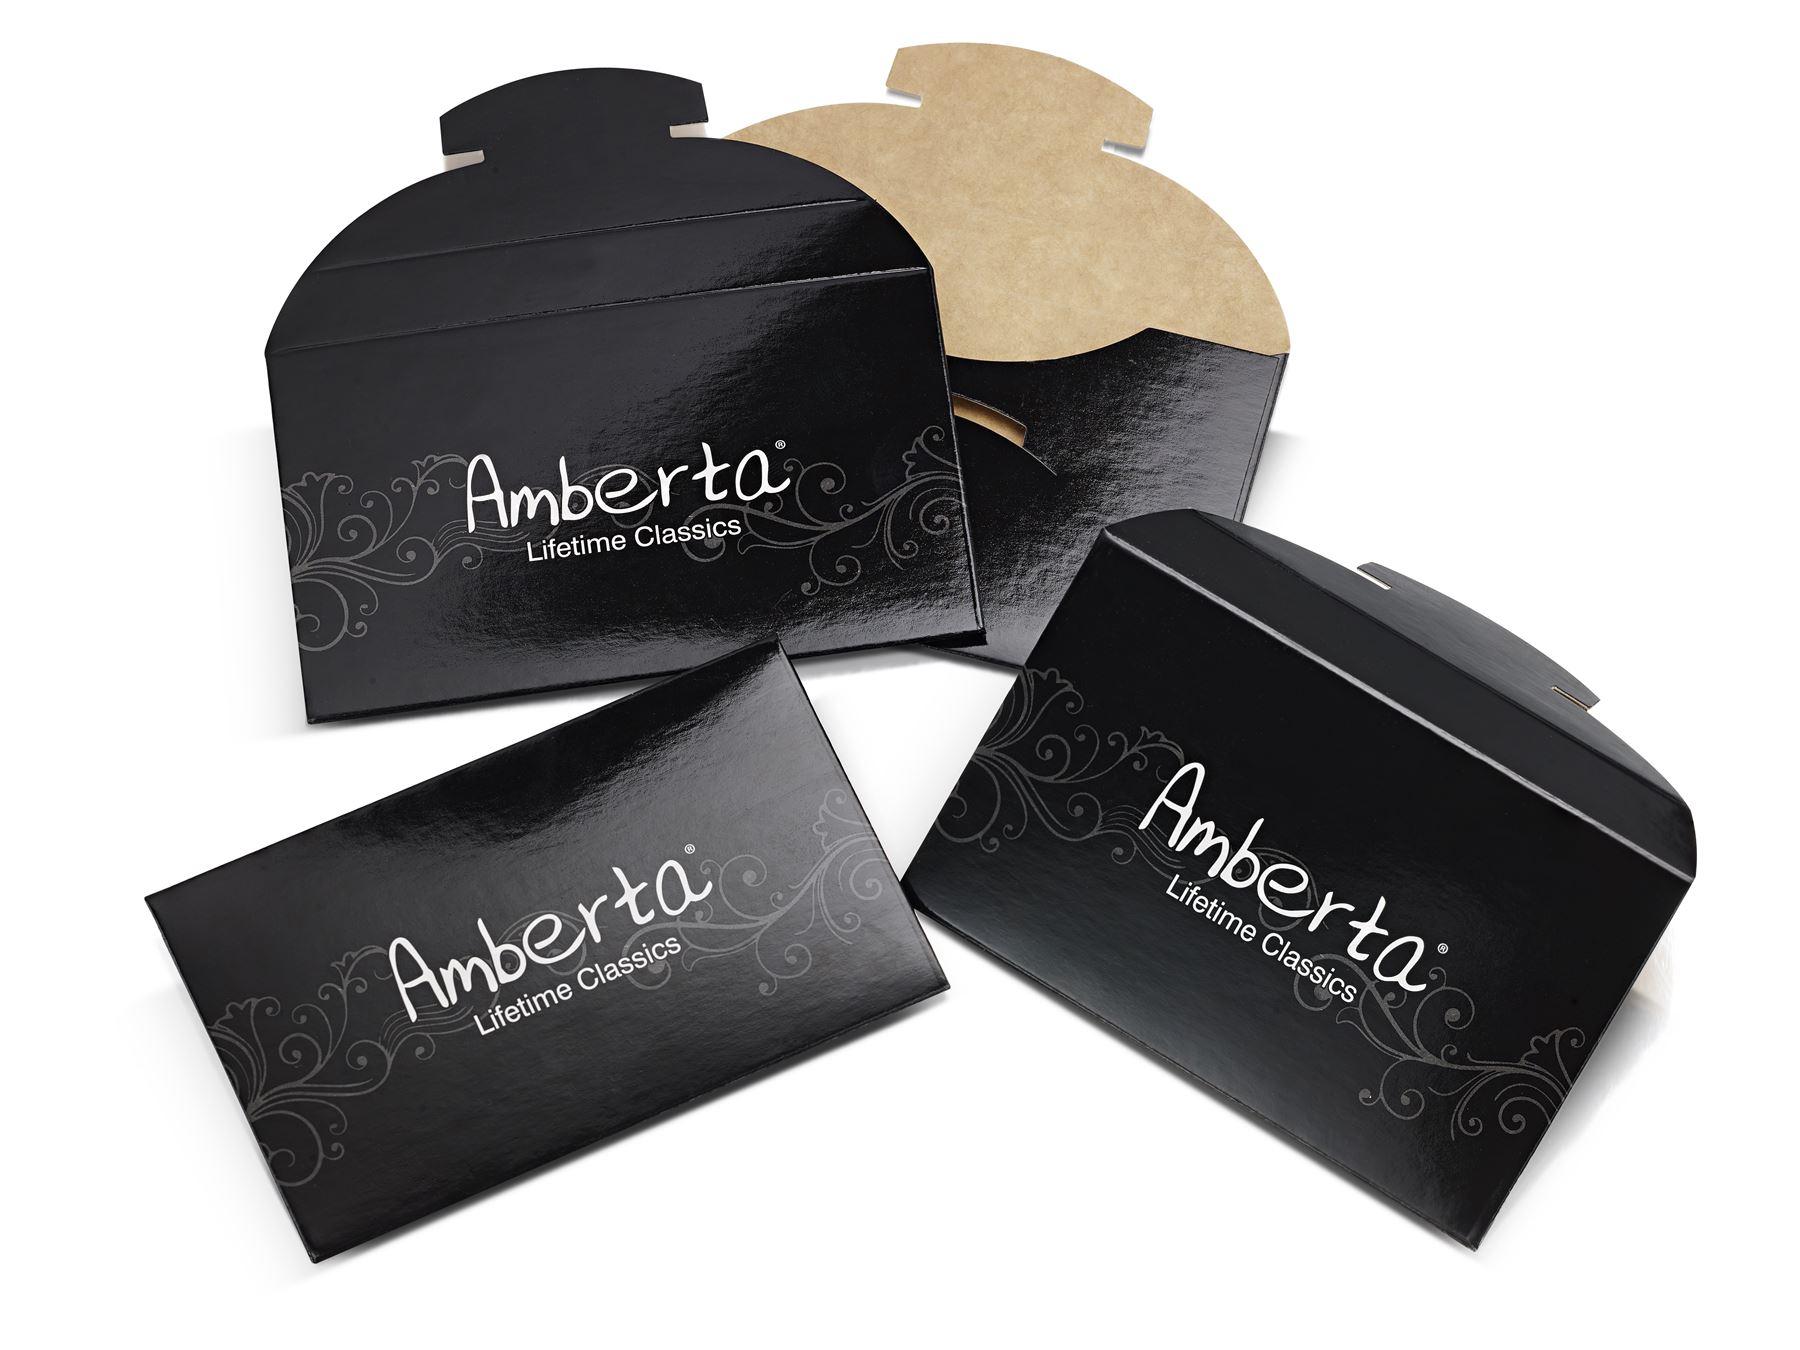 Amberta-Jewelry-925-Sterling-Silver-Adjustable-Bracelet-Italian-Bangle-for-Women thumbnail 61